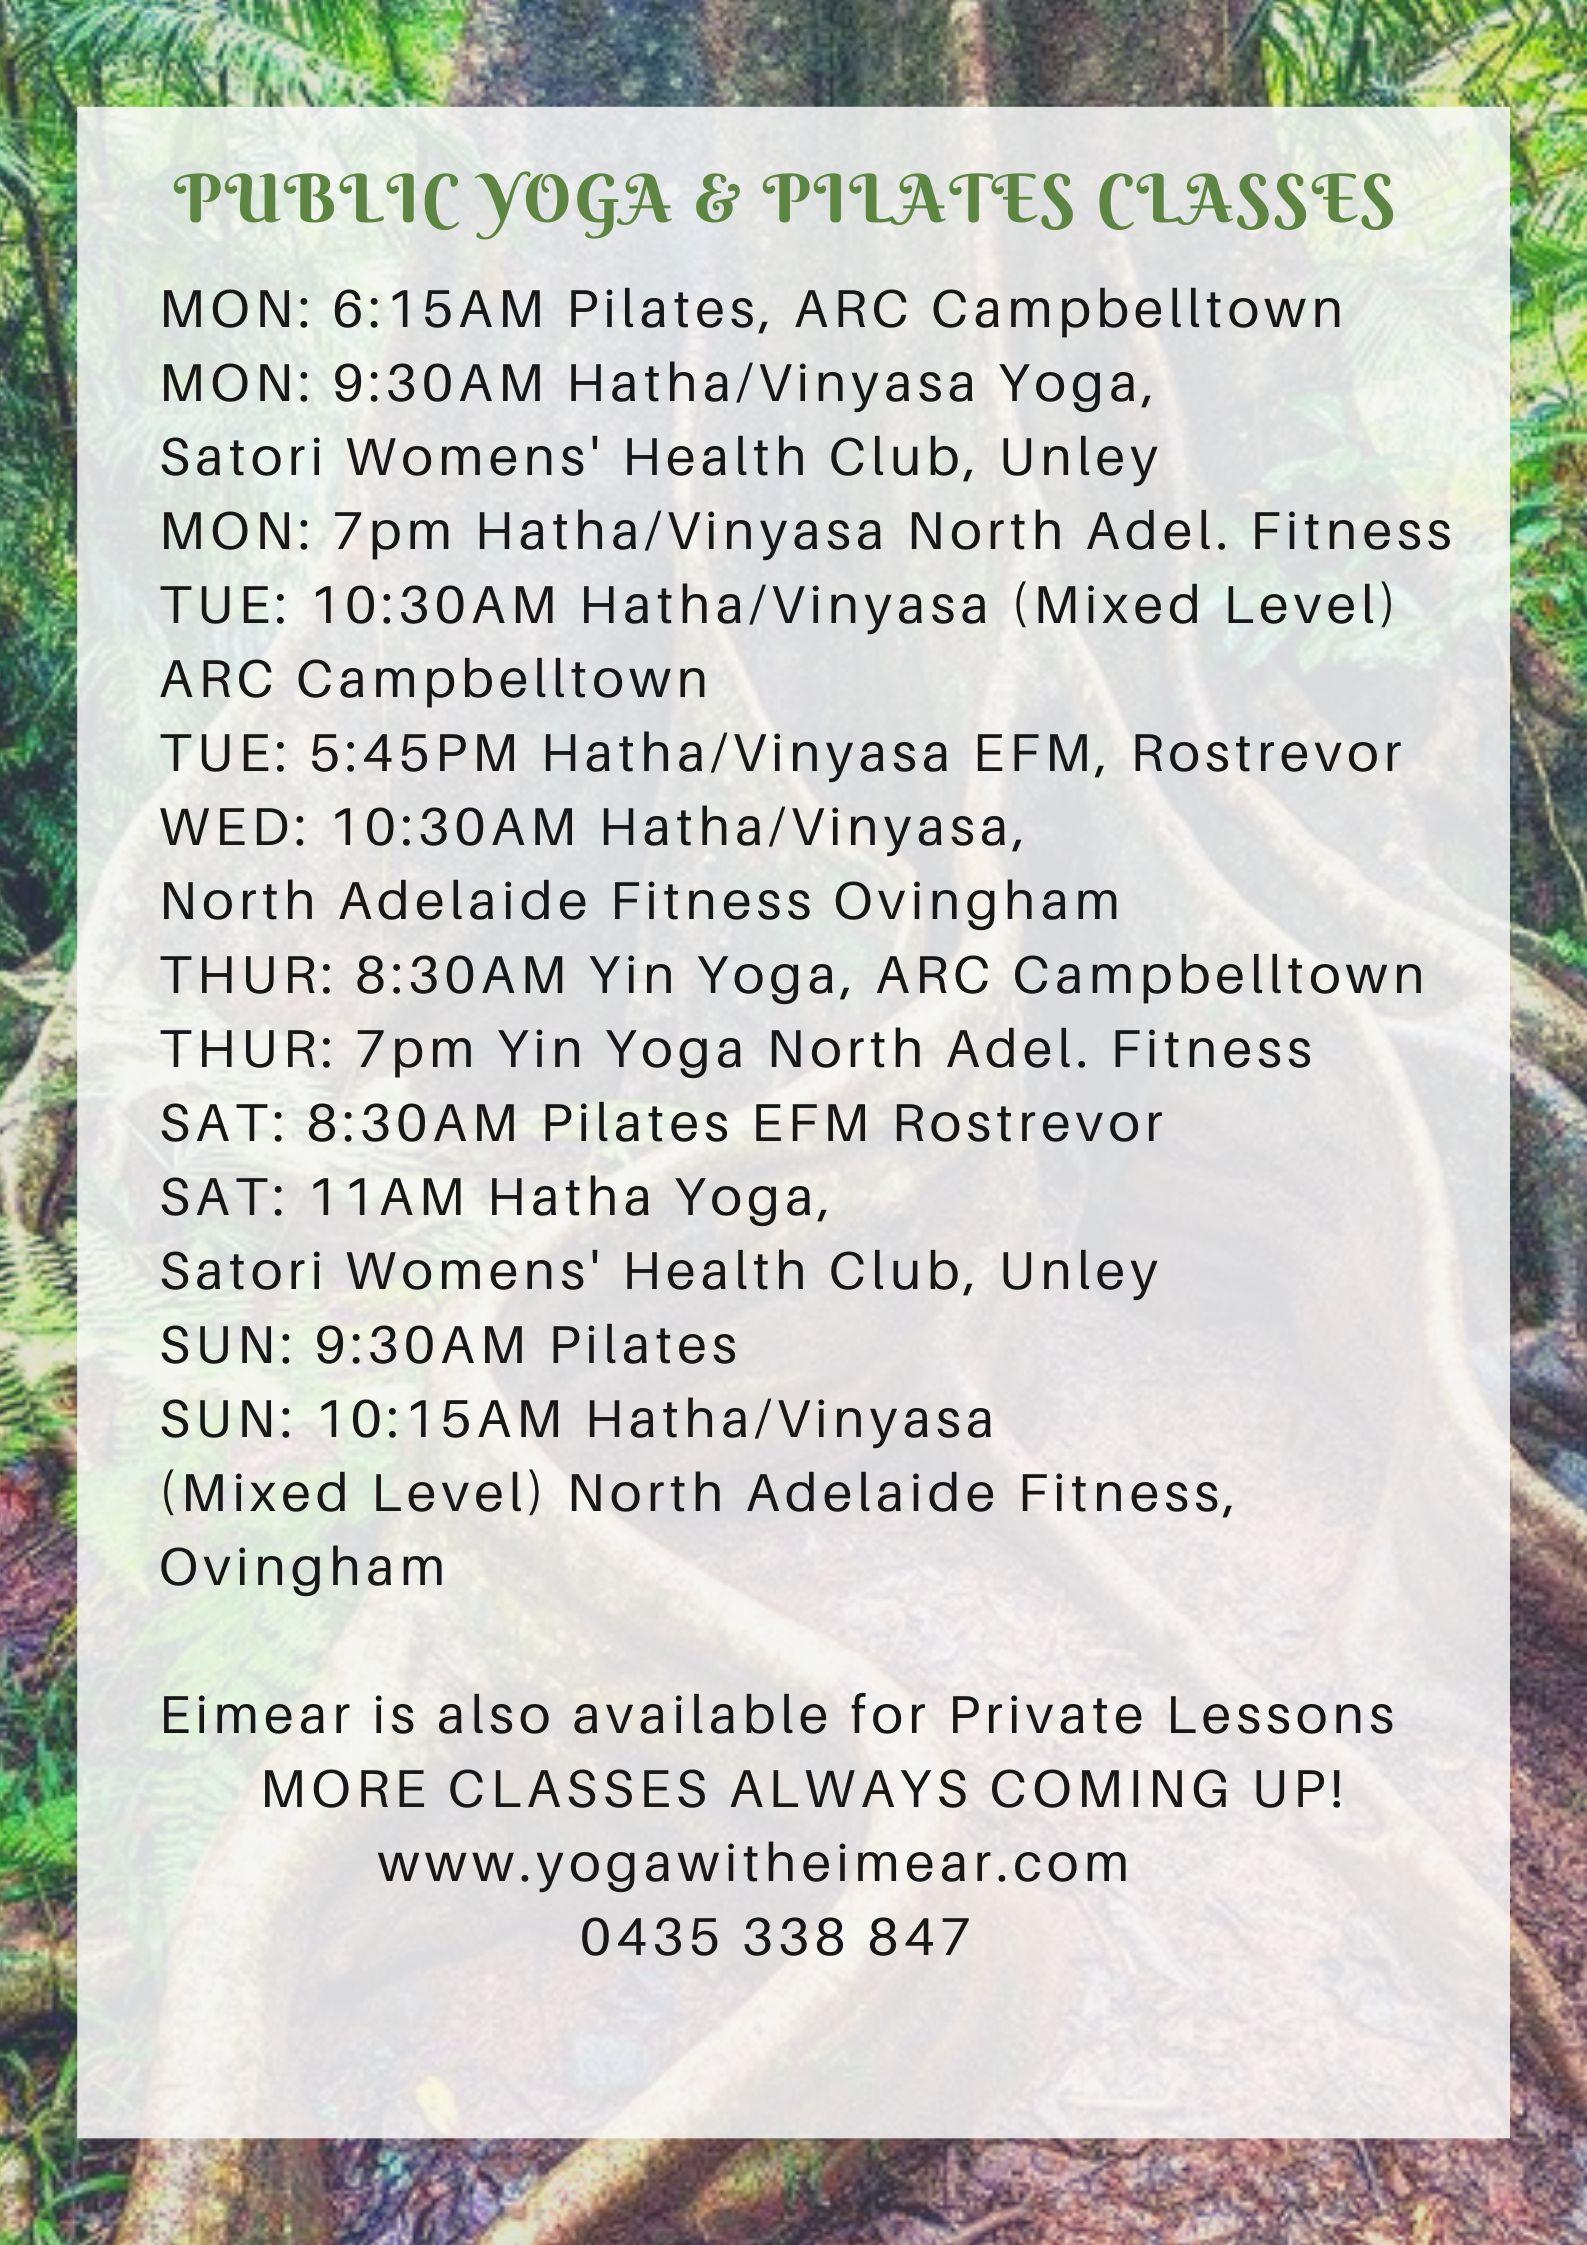 Yoga classes with Eimear